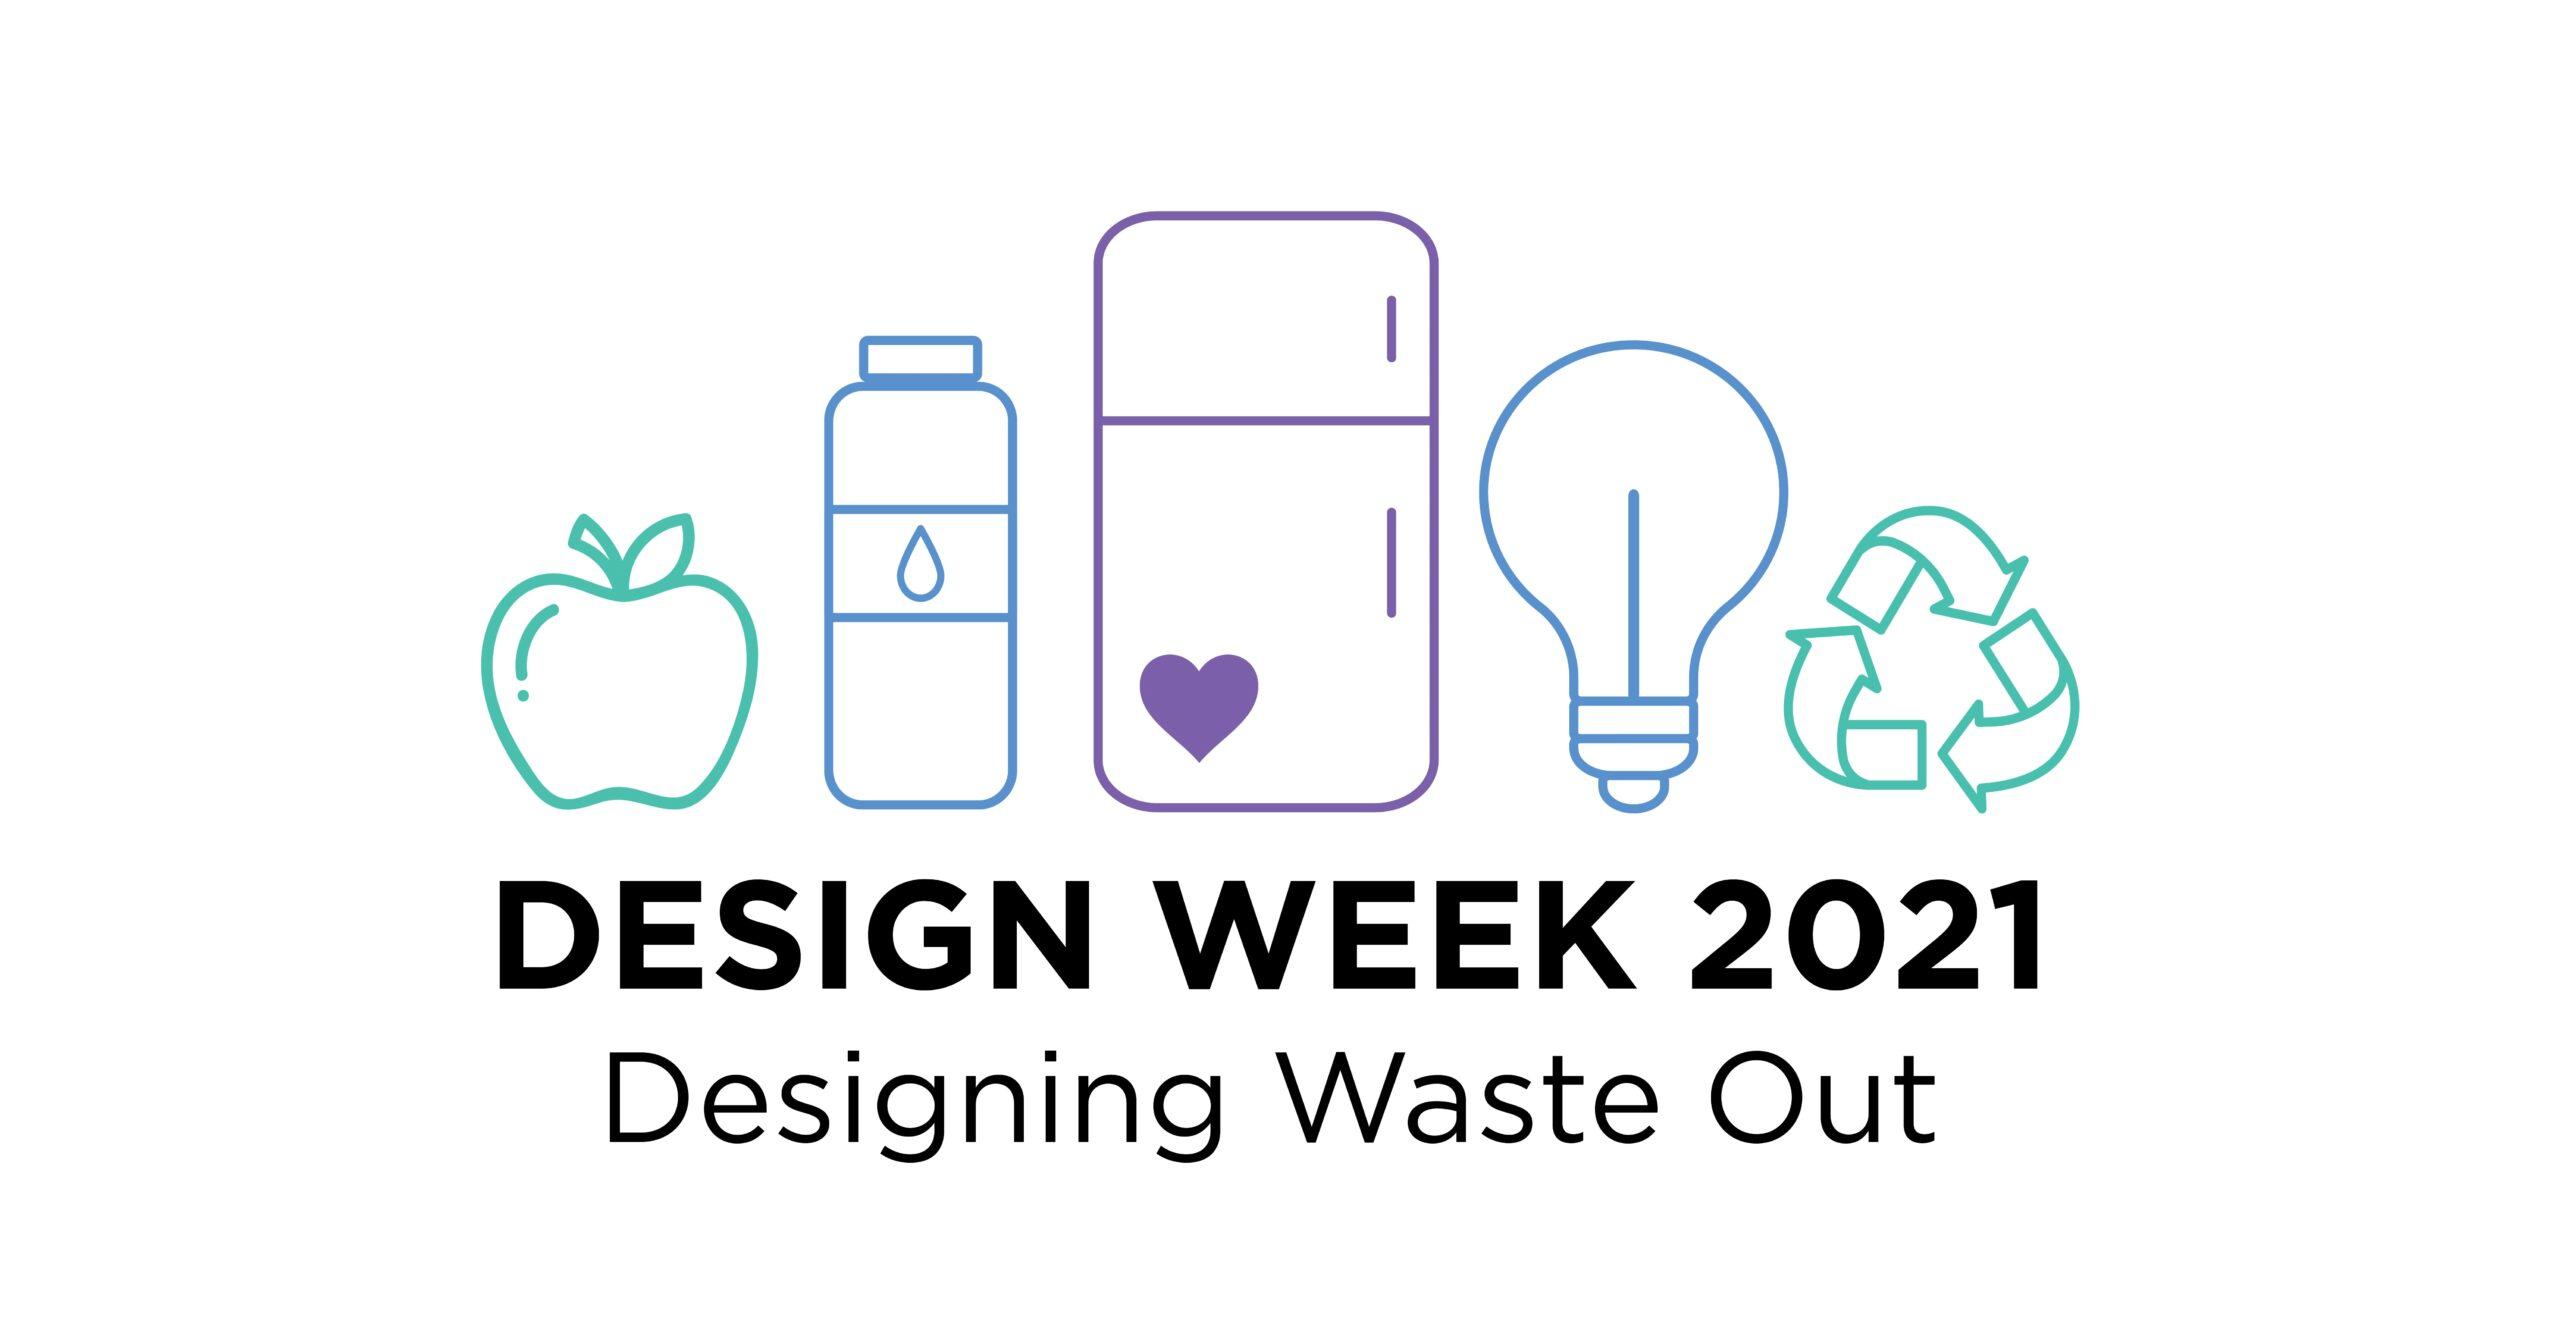 Design Week 2021 Flyer